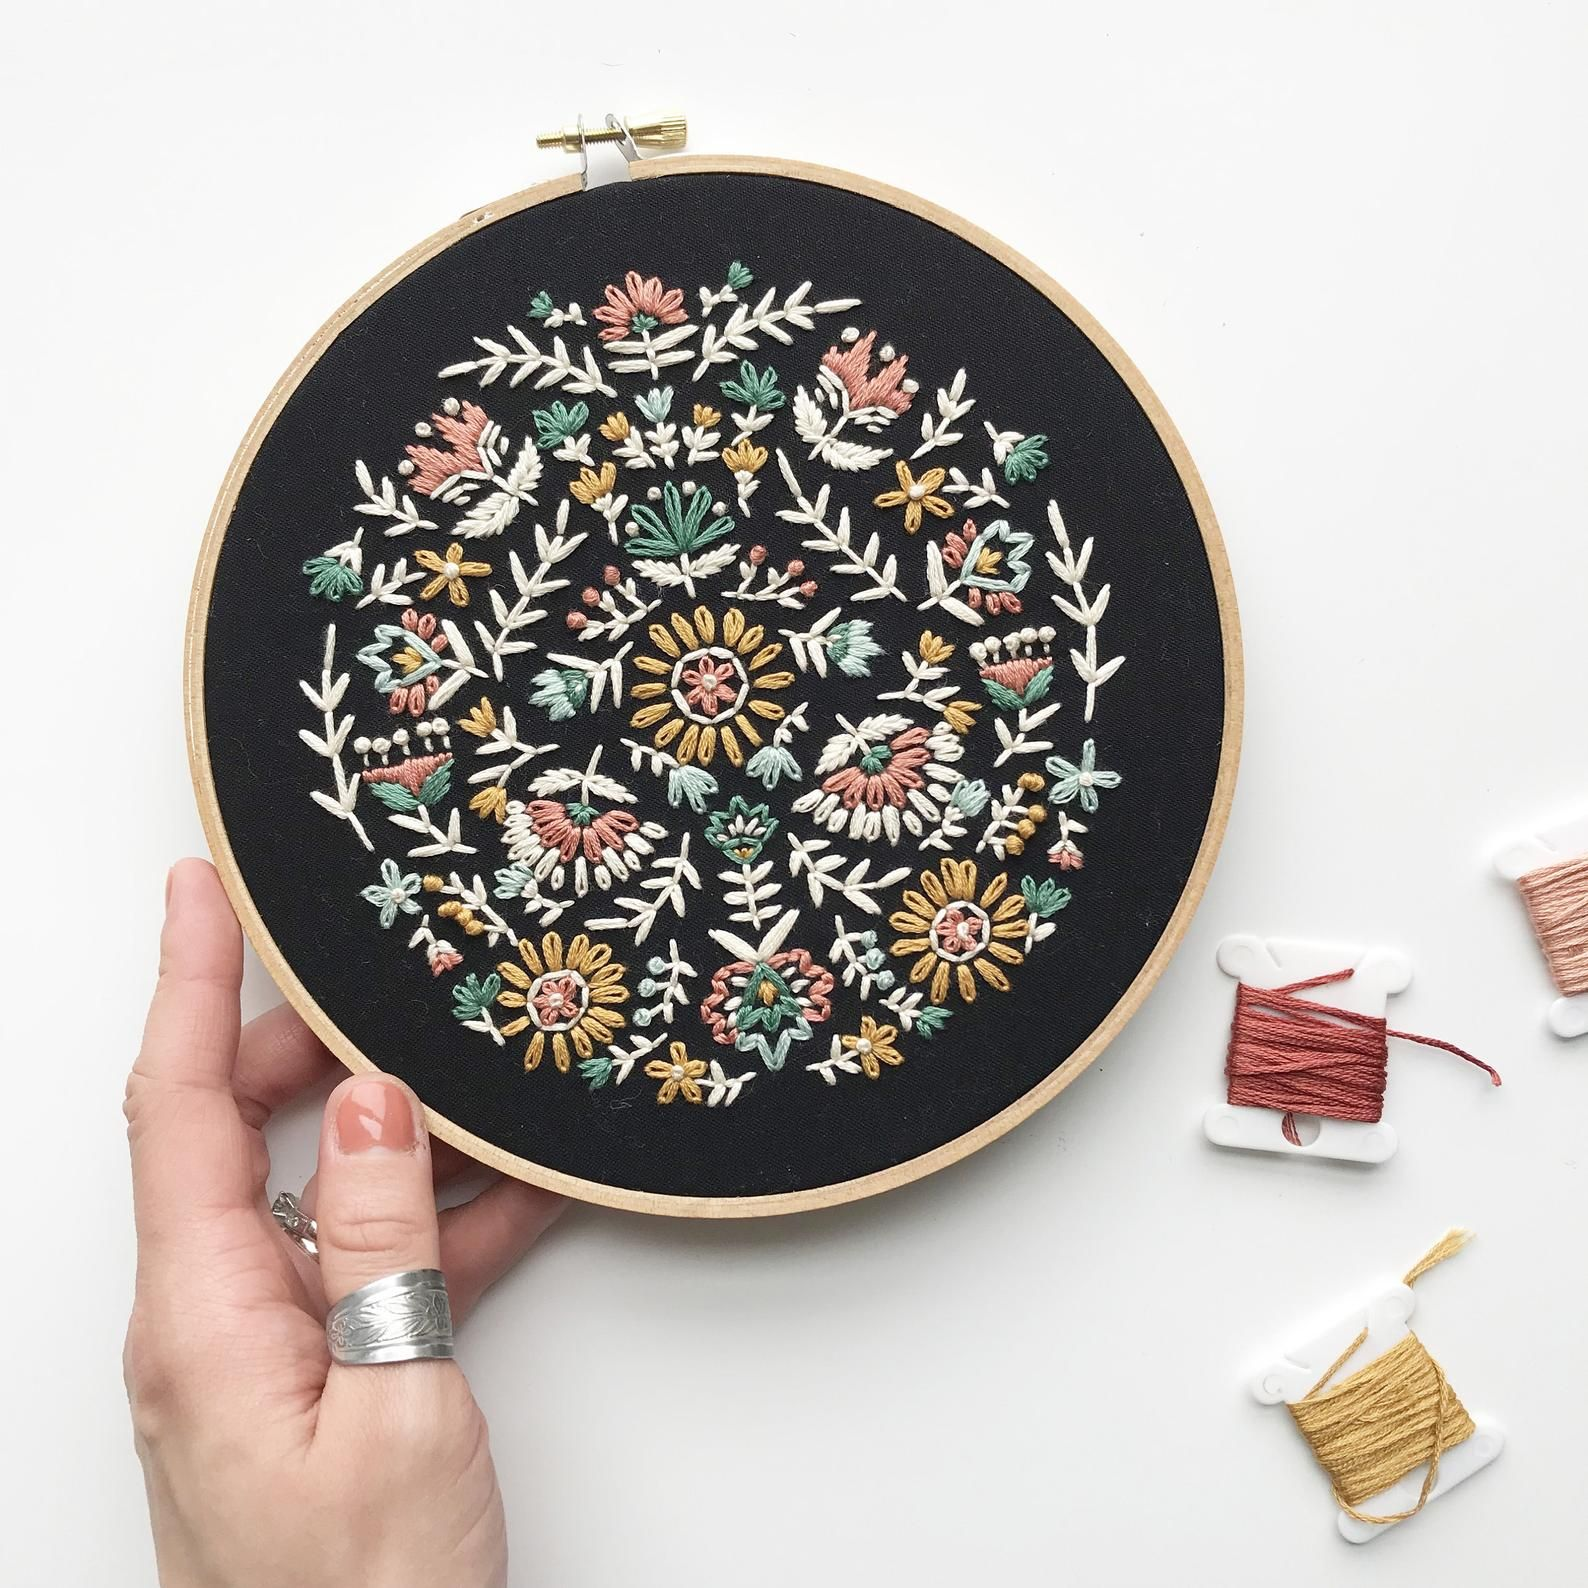 Folk Floral Embroidery Scandinavian Floral Embroidery Etsy In 2020 Scandinavian Embroidery Floral Embroidery Patterns Modern Embroidery